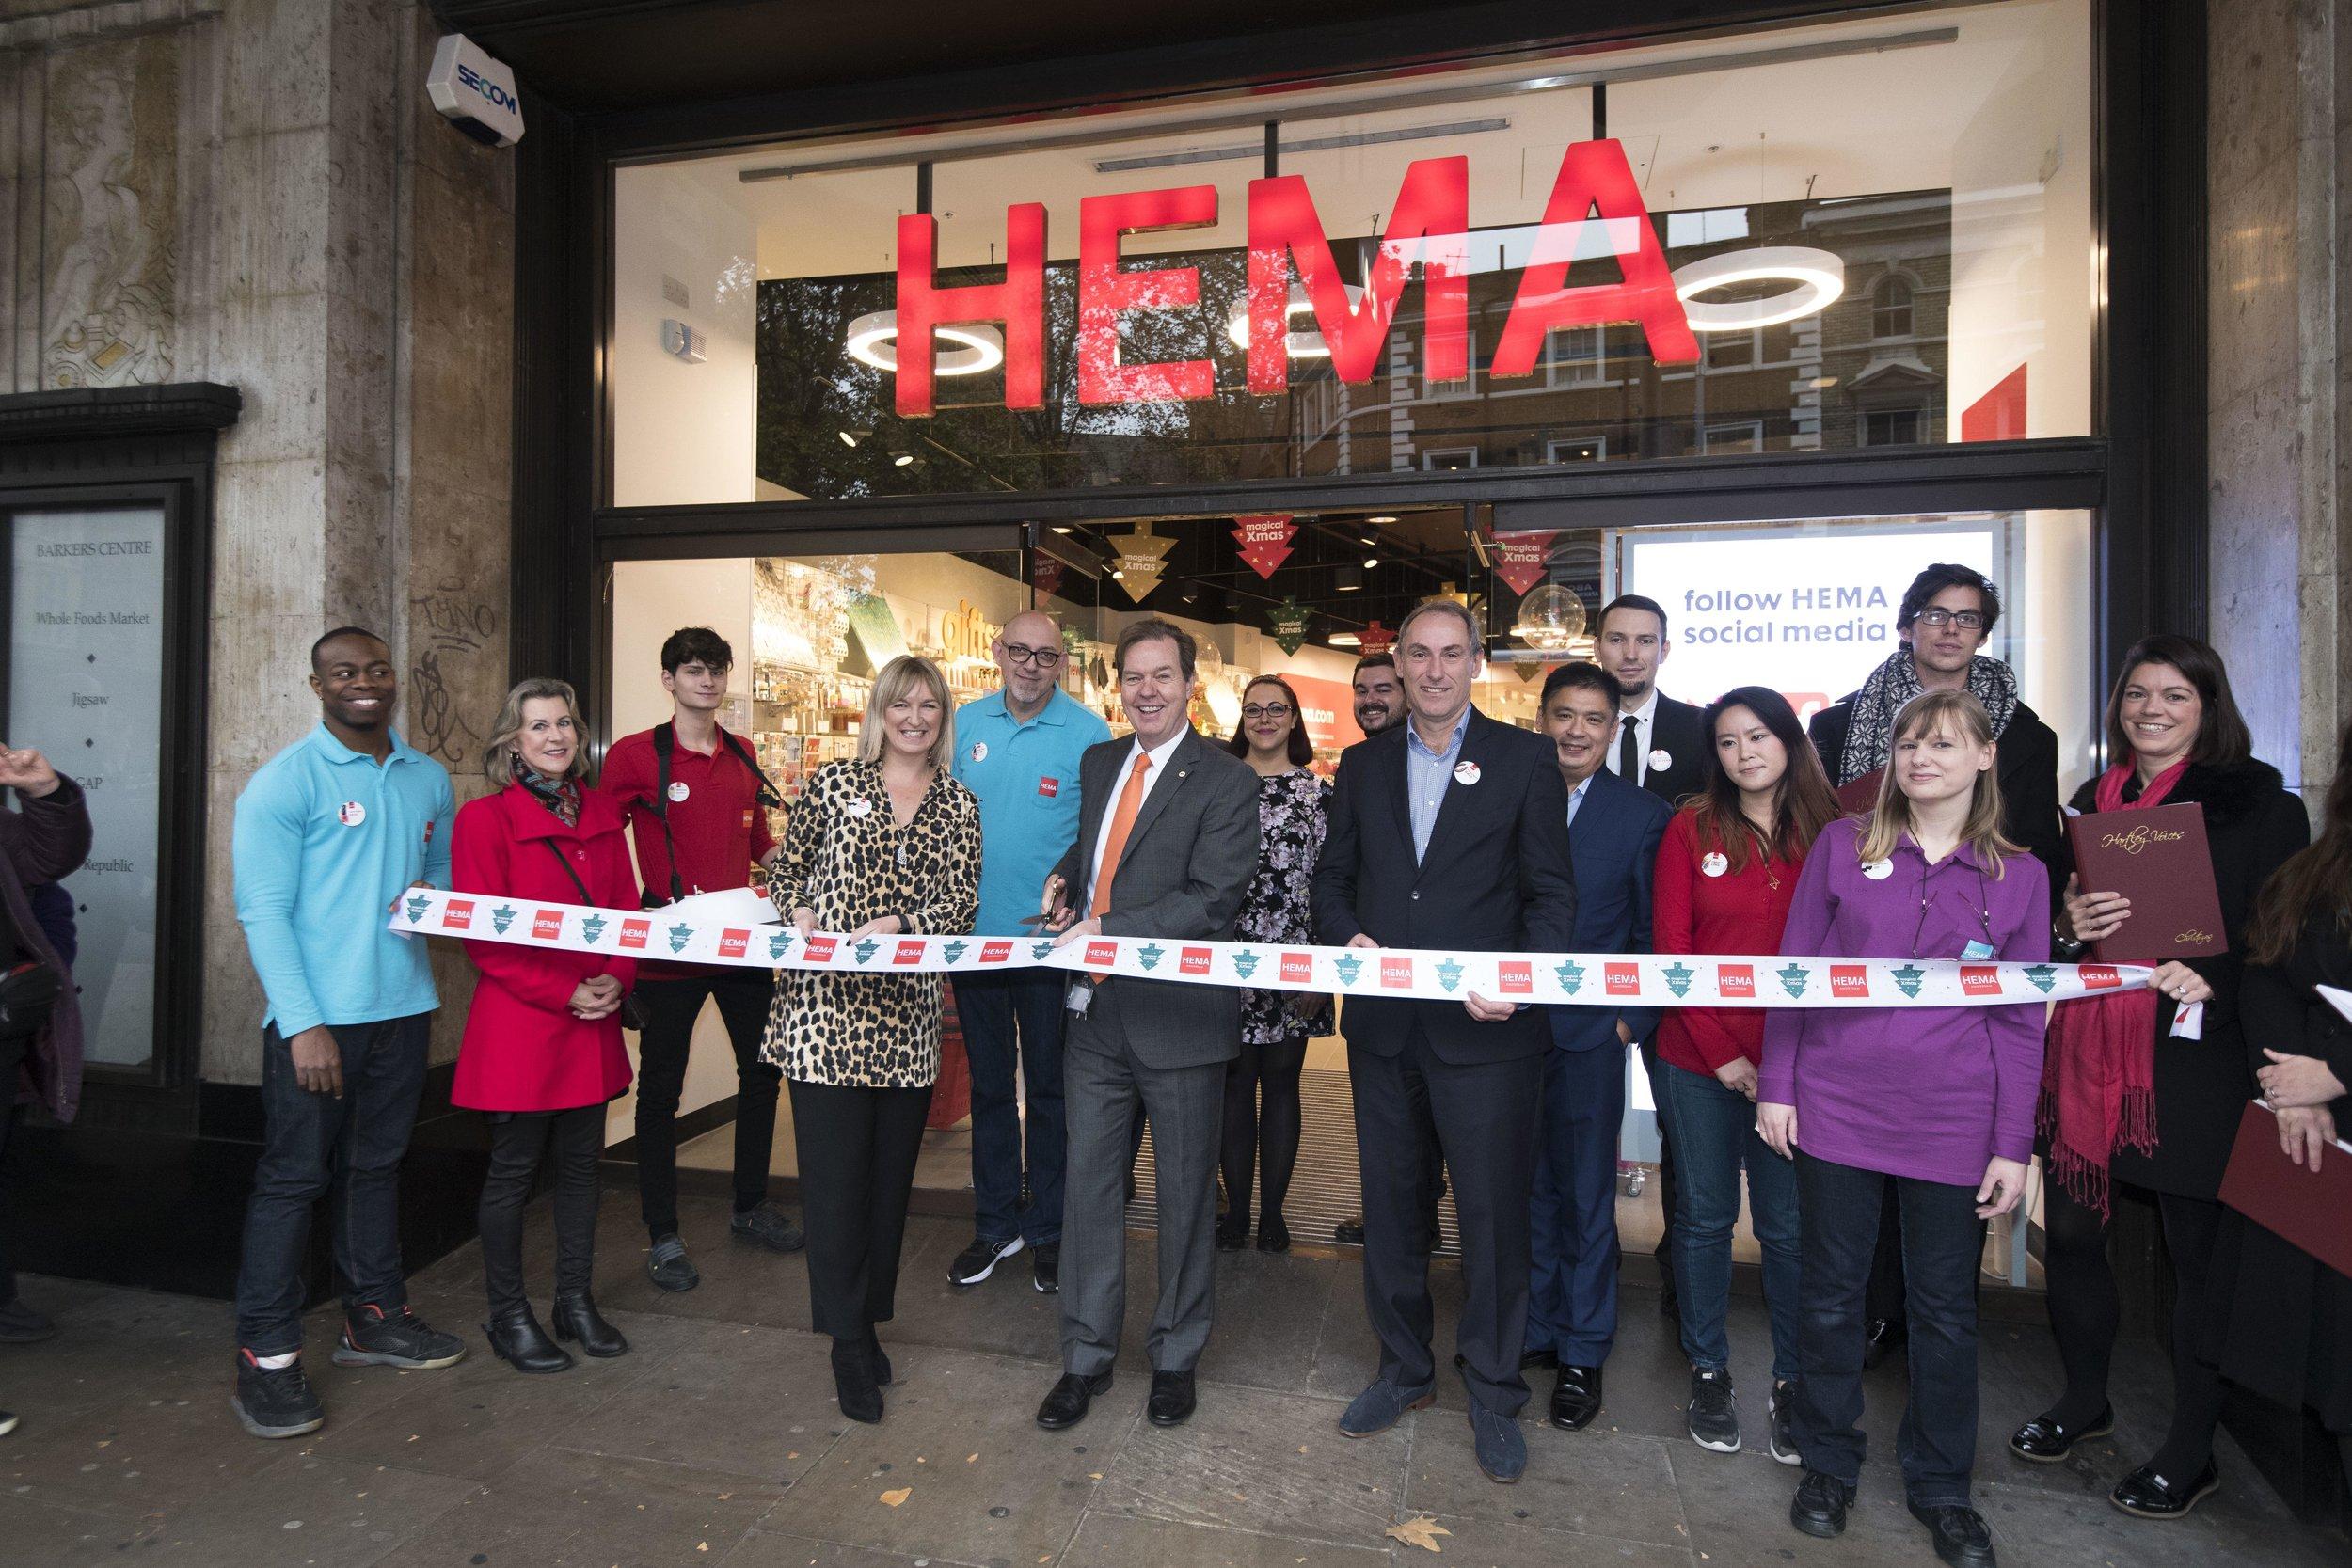 OPENING OF HEMA'S HIGH STREET KENSINGTON STORE IN LONDON, ENGLAND PHOTO: HEMA VIA LINKEDIN